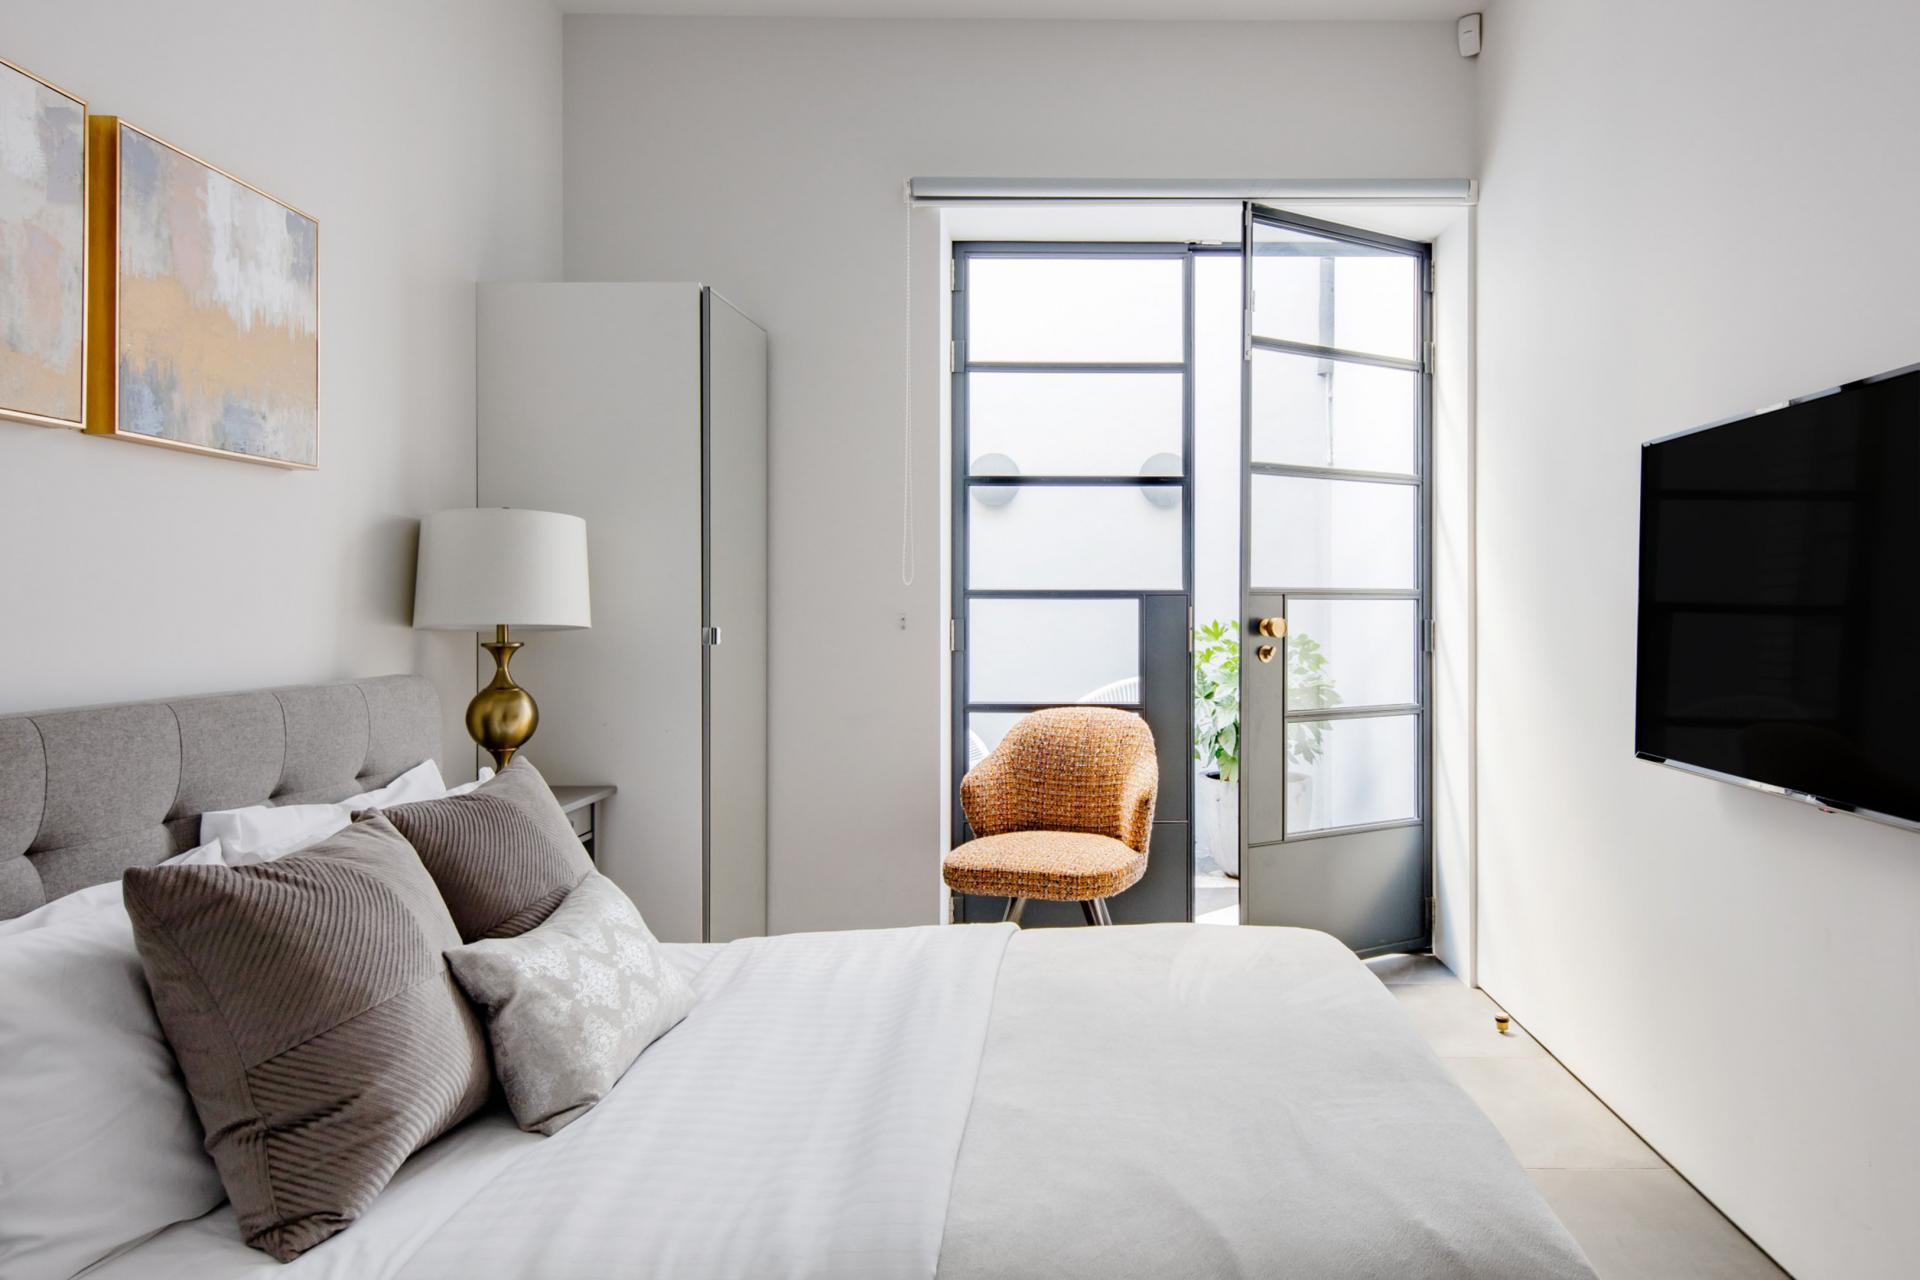 Bedroom at Royalty Mews, Carnaby, London - Citybase Apartments